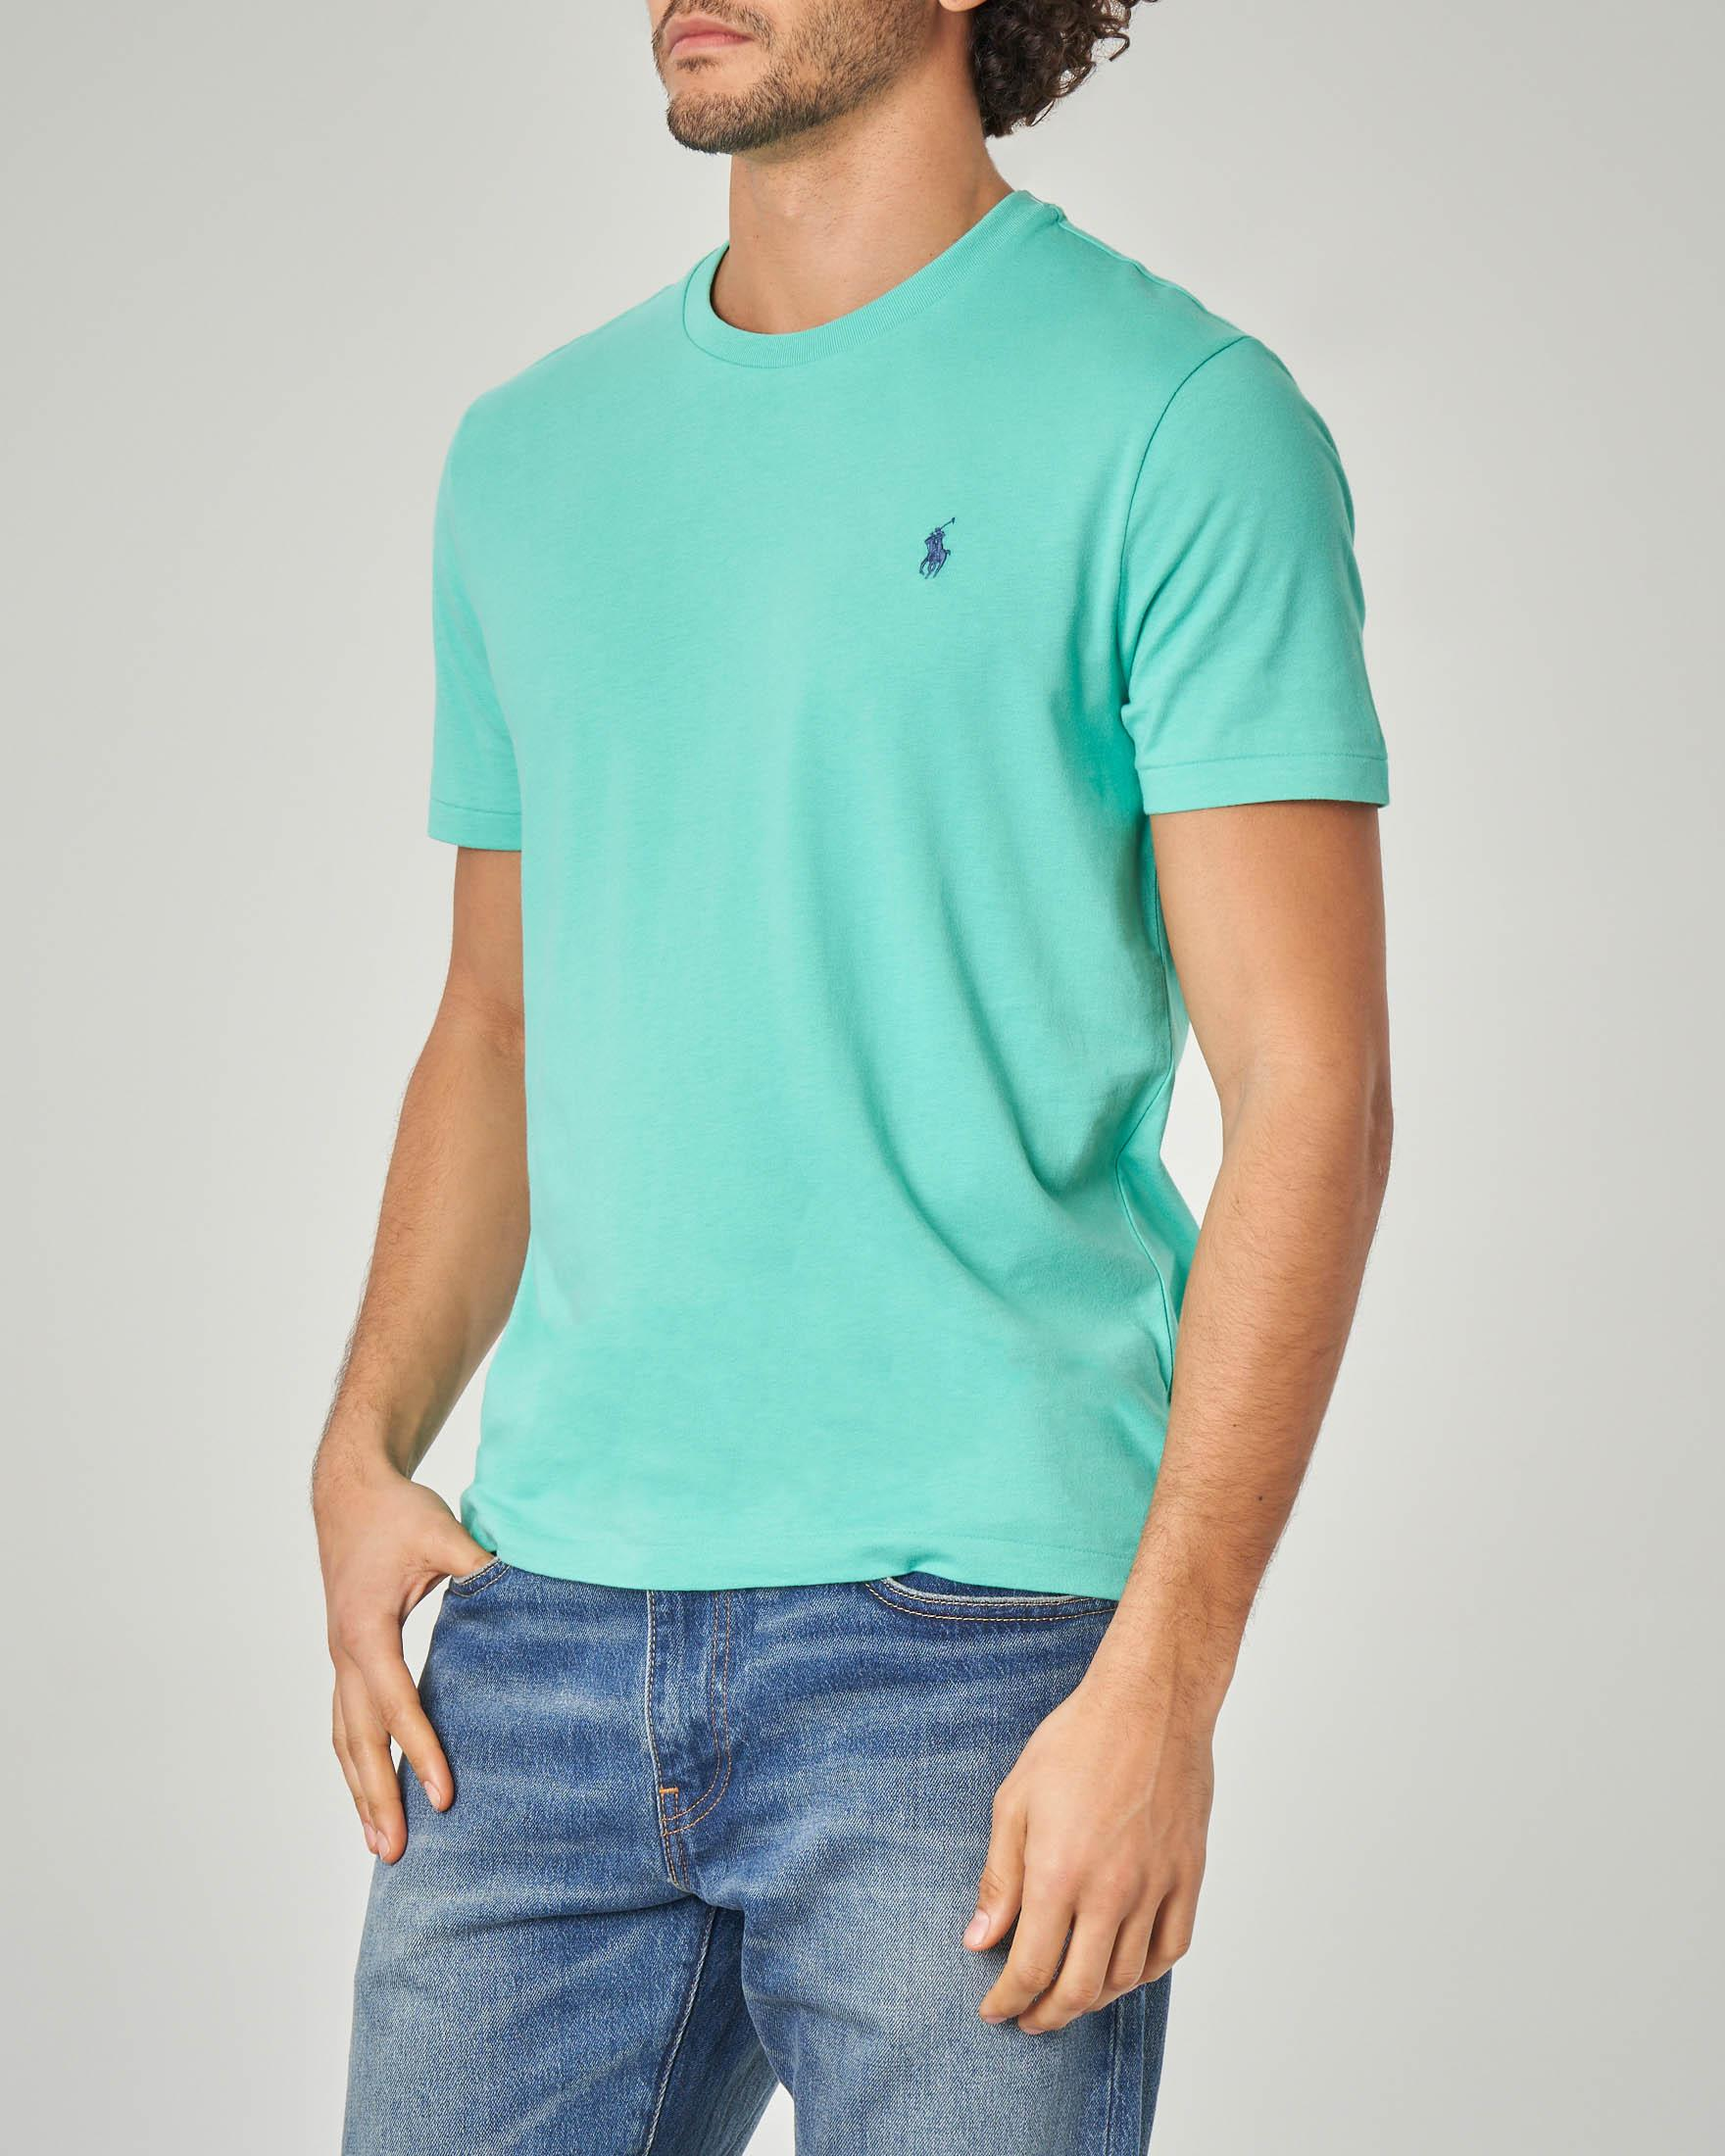 T-shirt verde acqua con logo blu